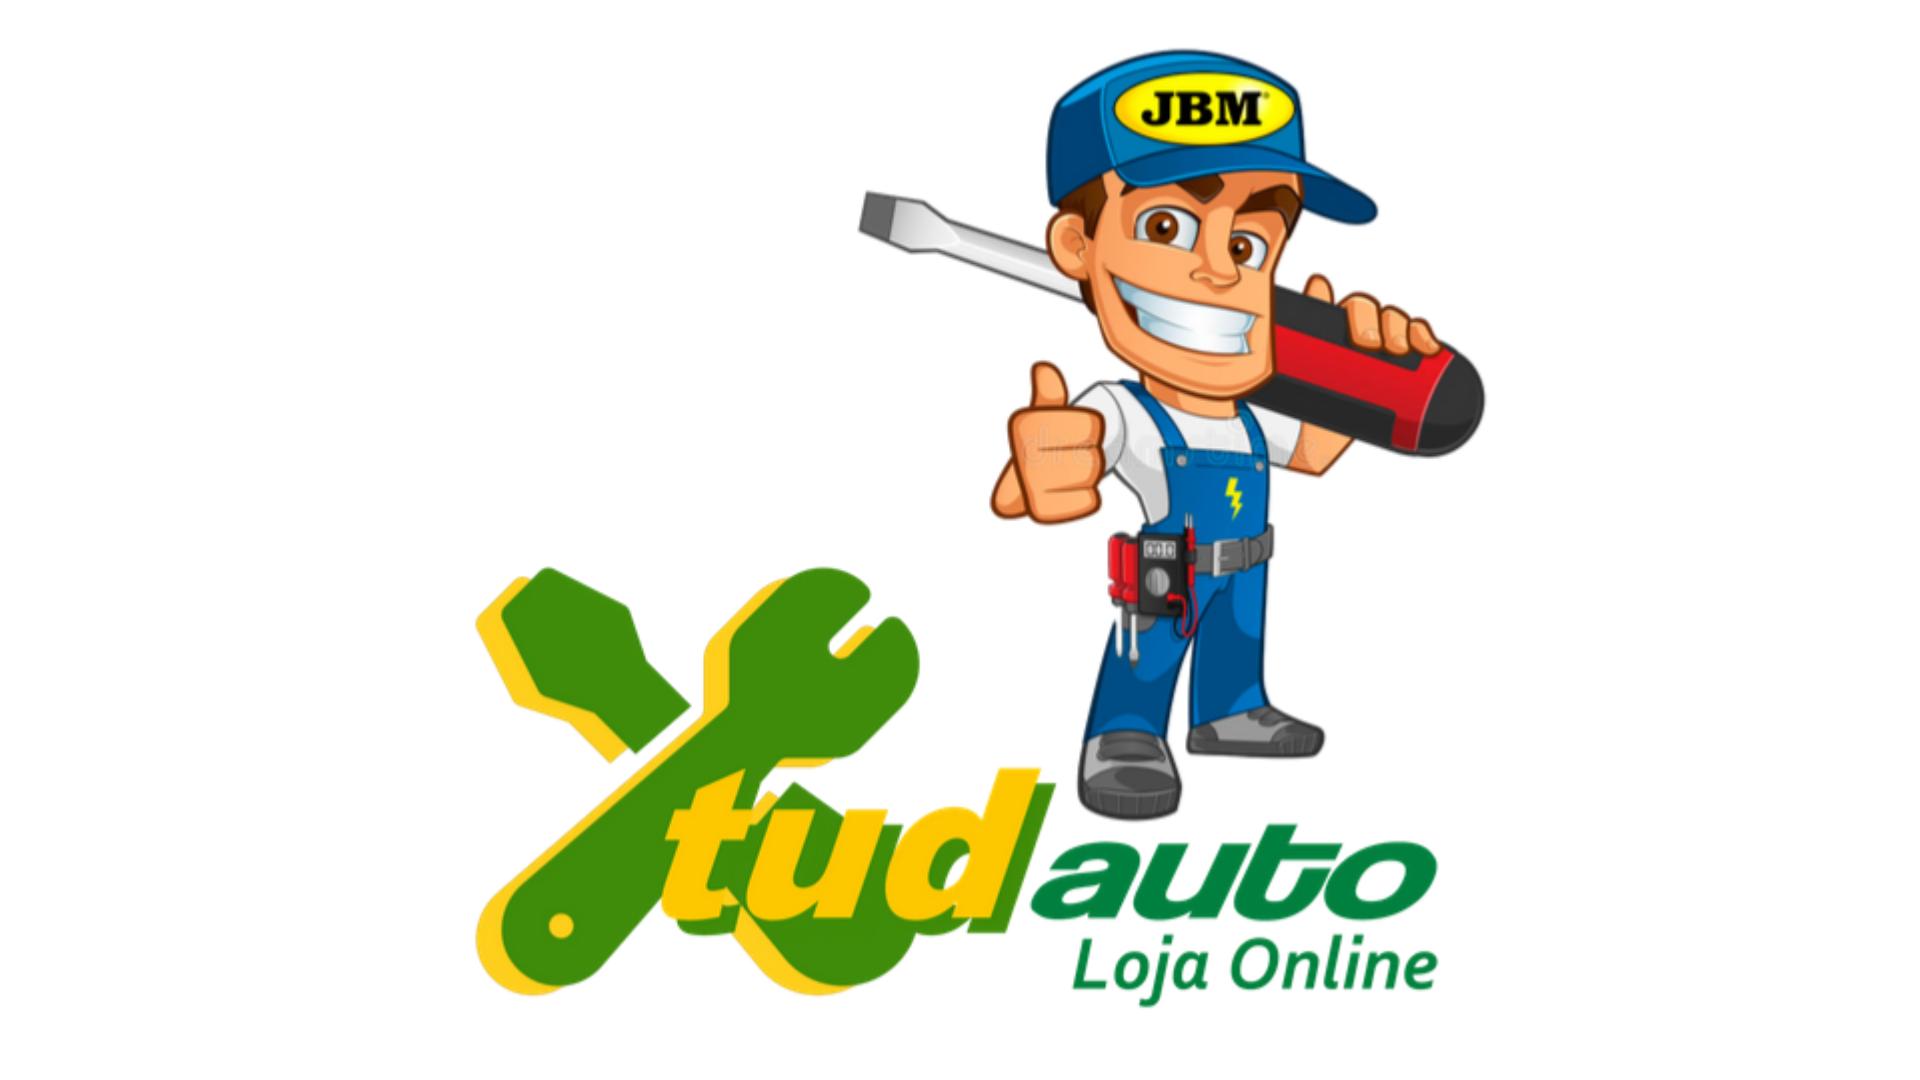 Tudauto - Loja Online